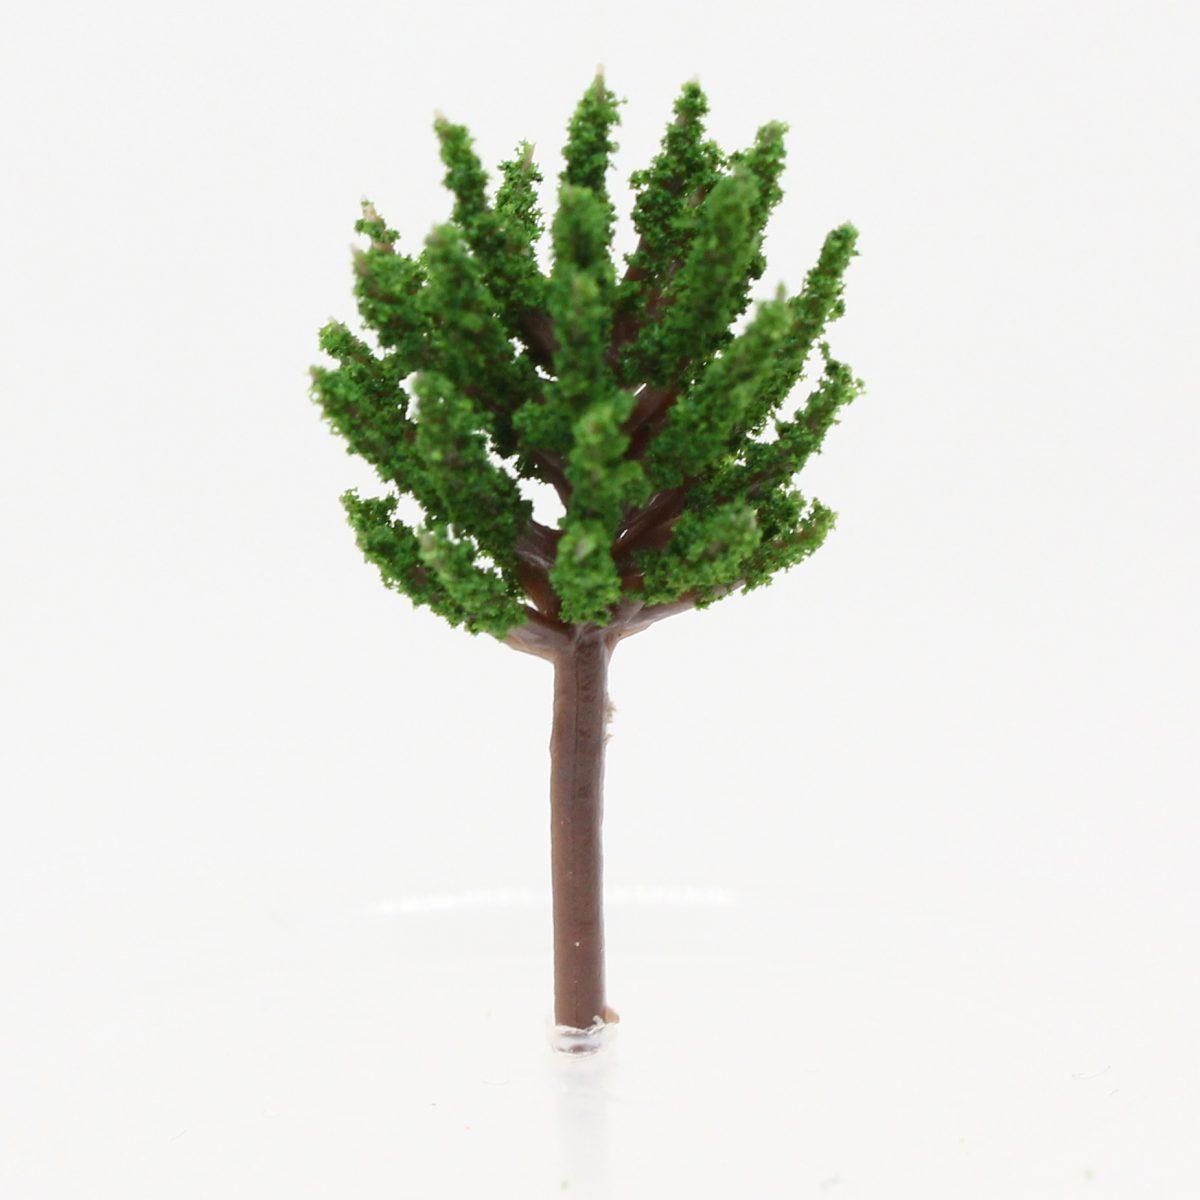 Model tree/bush - 3cm Image 1